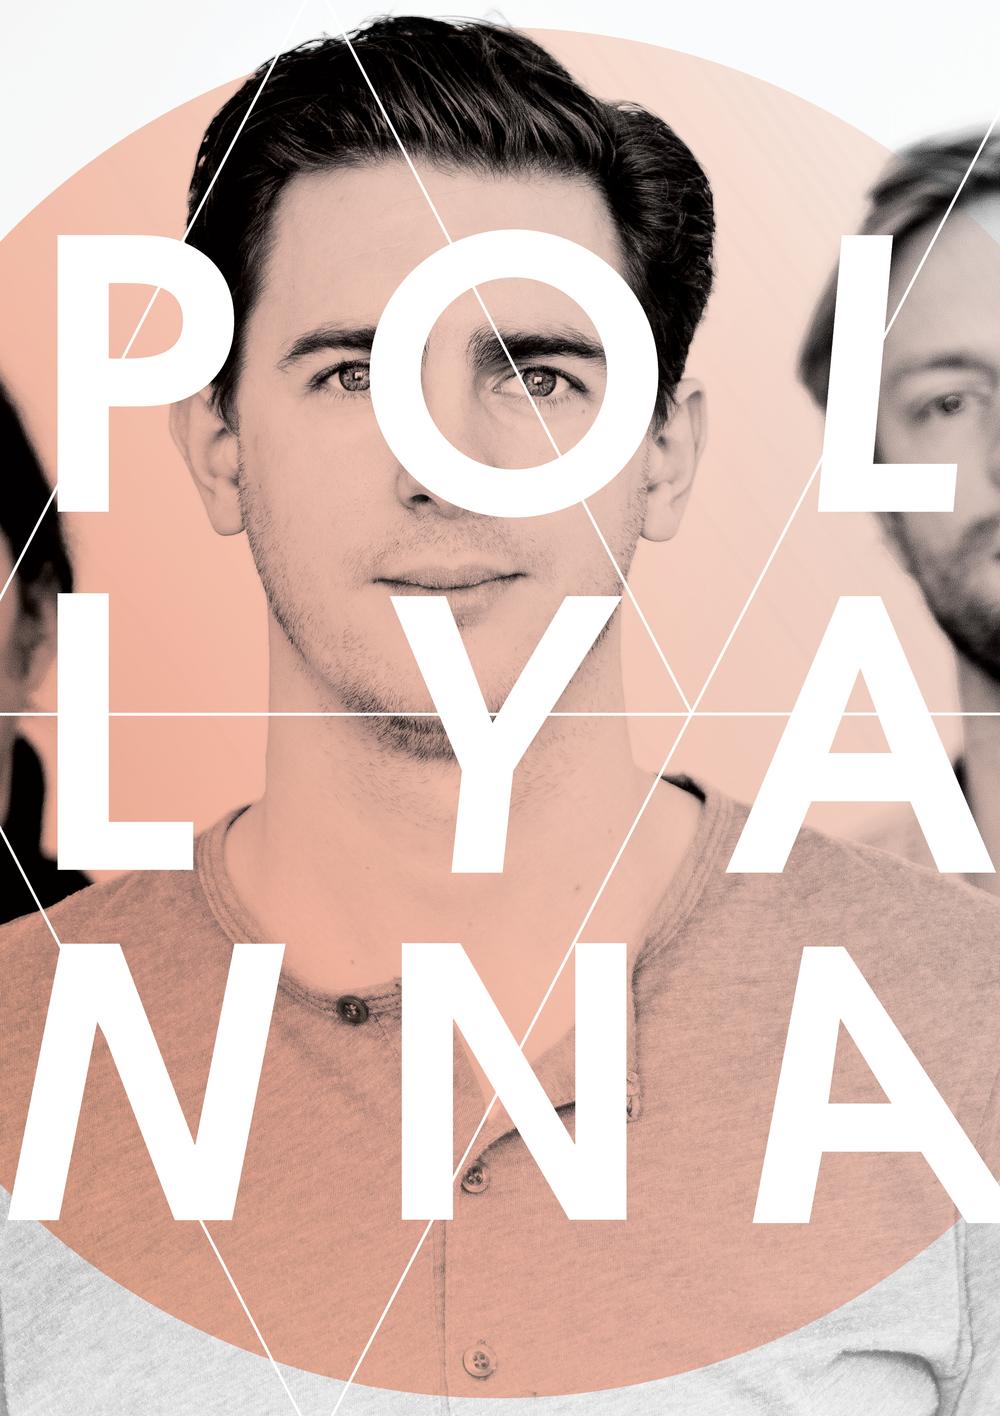 Pollyanna albumcover | fotografie